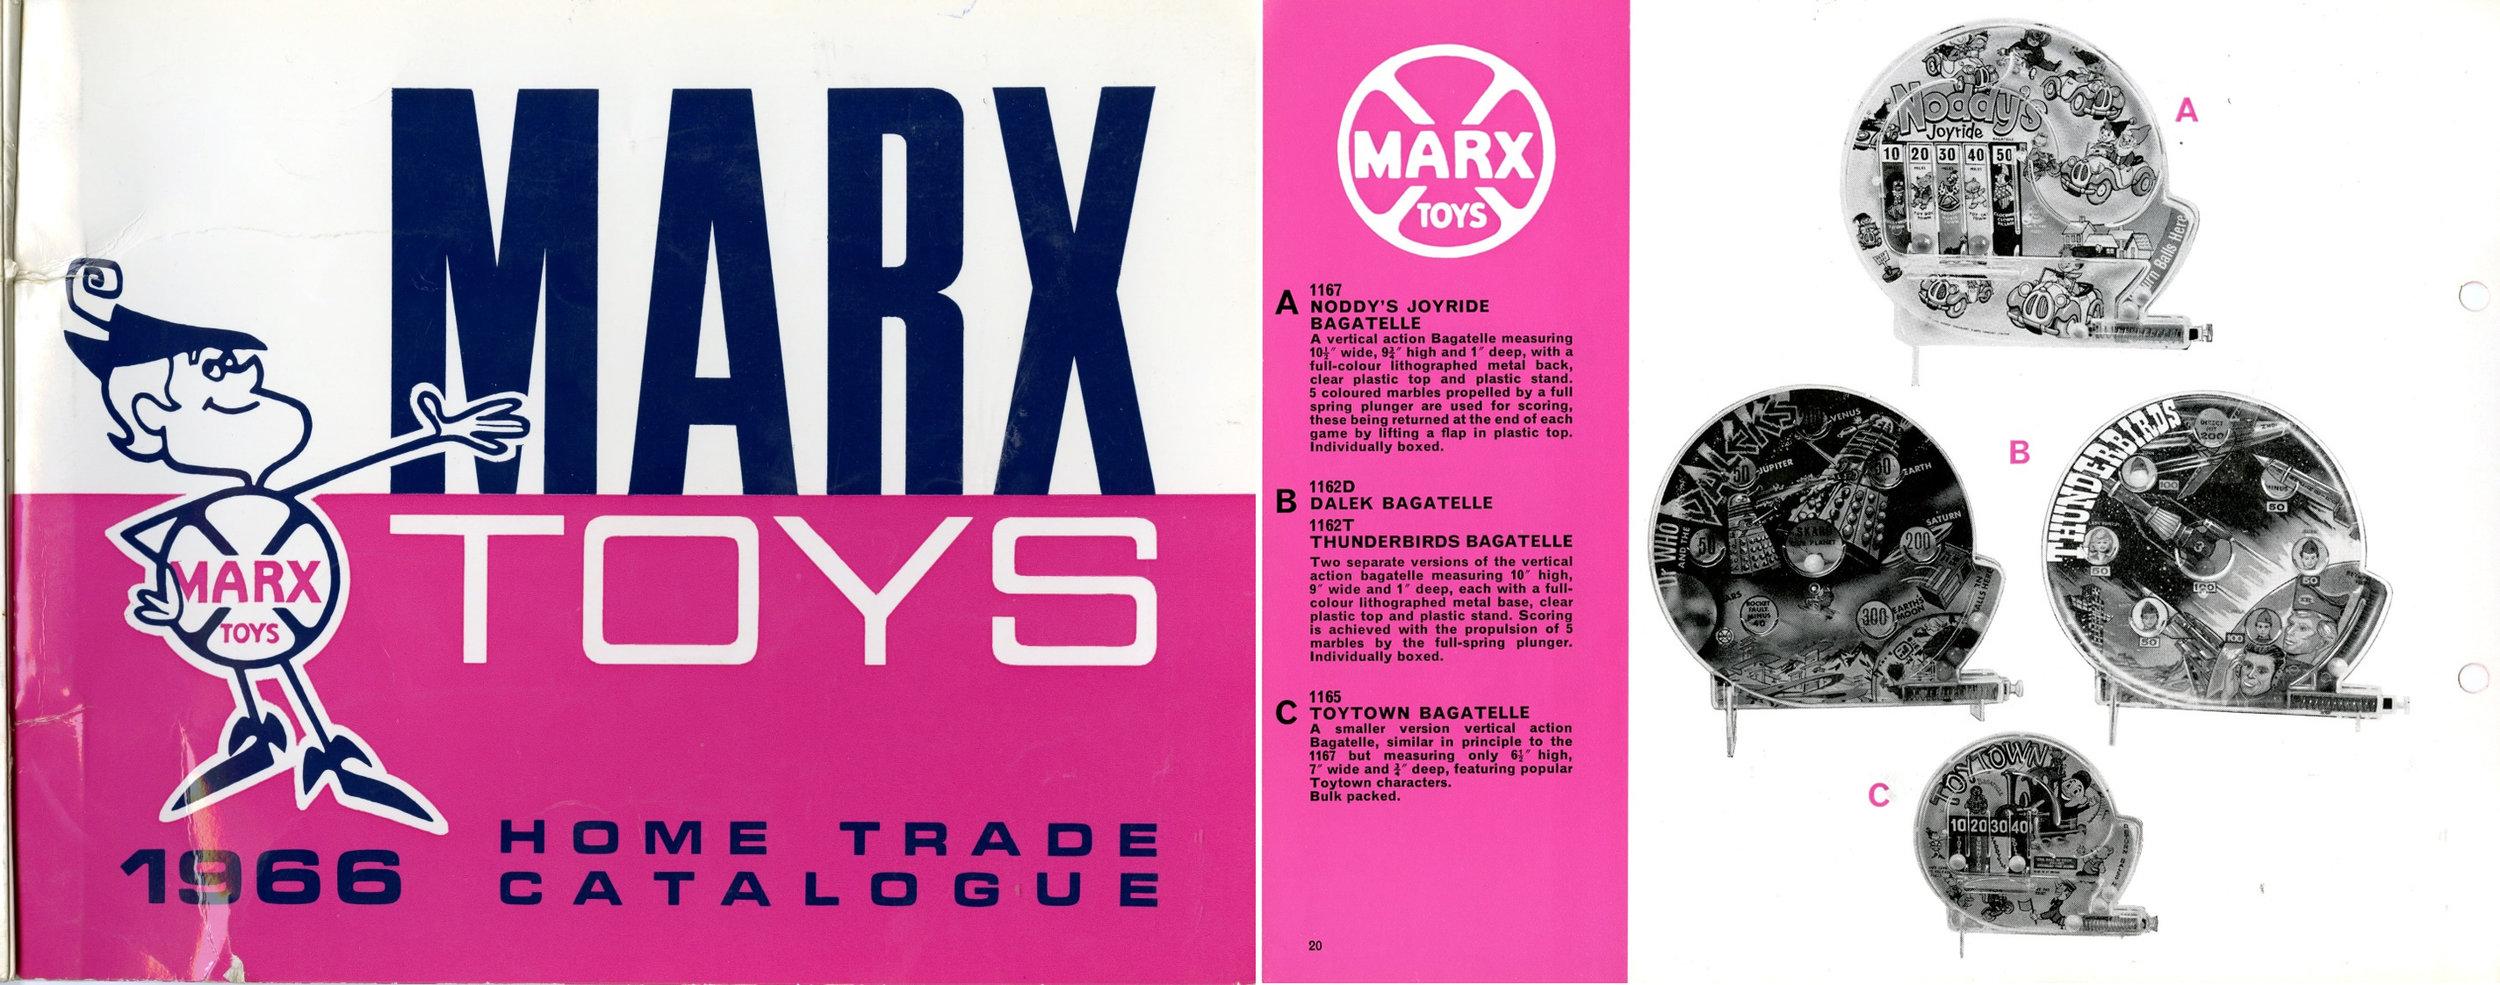 Louis Marx and Company Ltd., Marx Toys 1966 Home Trade Catalogue showing large circular Dalek bagatelle.